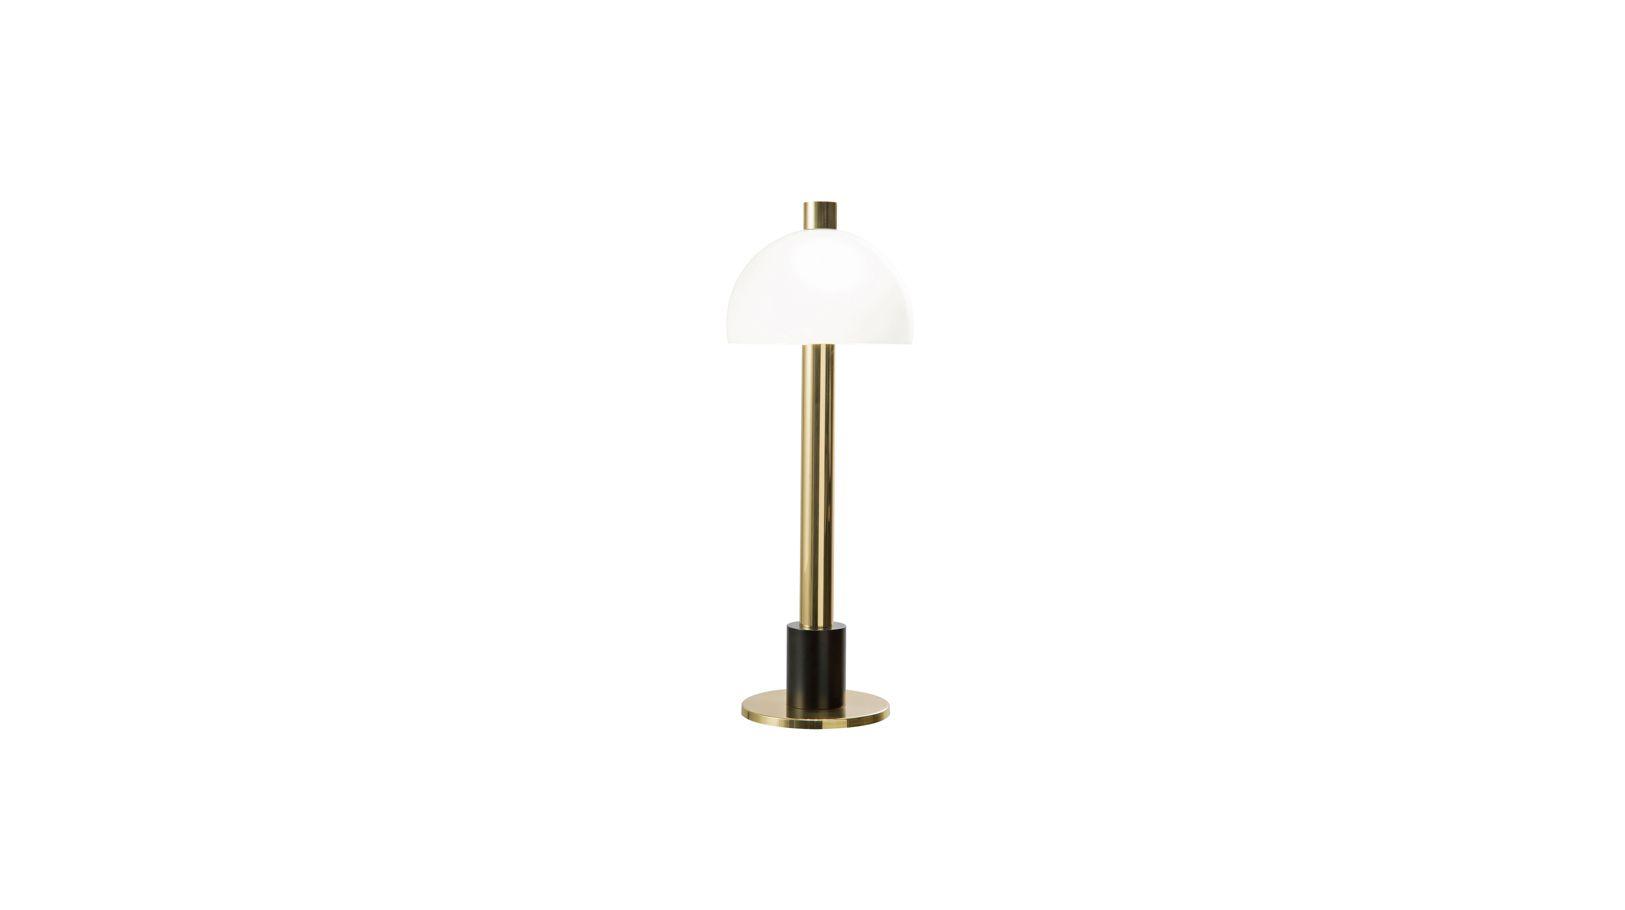 Agata table lamp roche bobois - Tables de chevet roche bobois ...